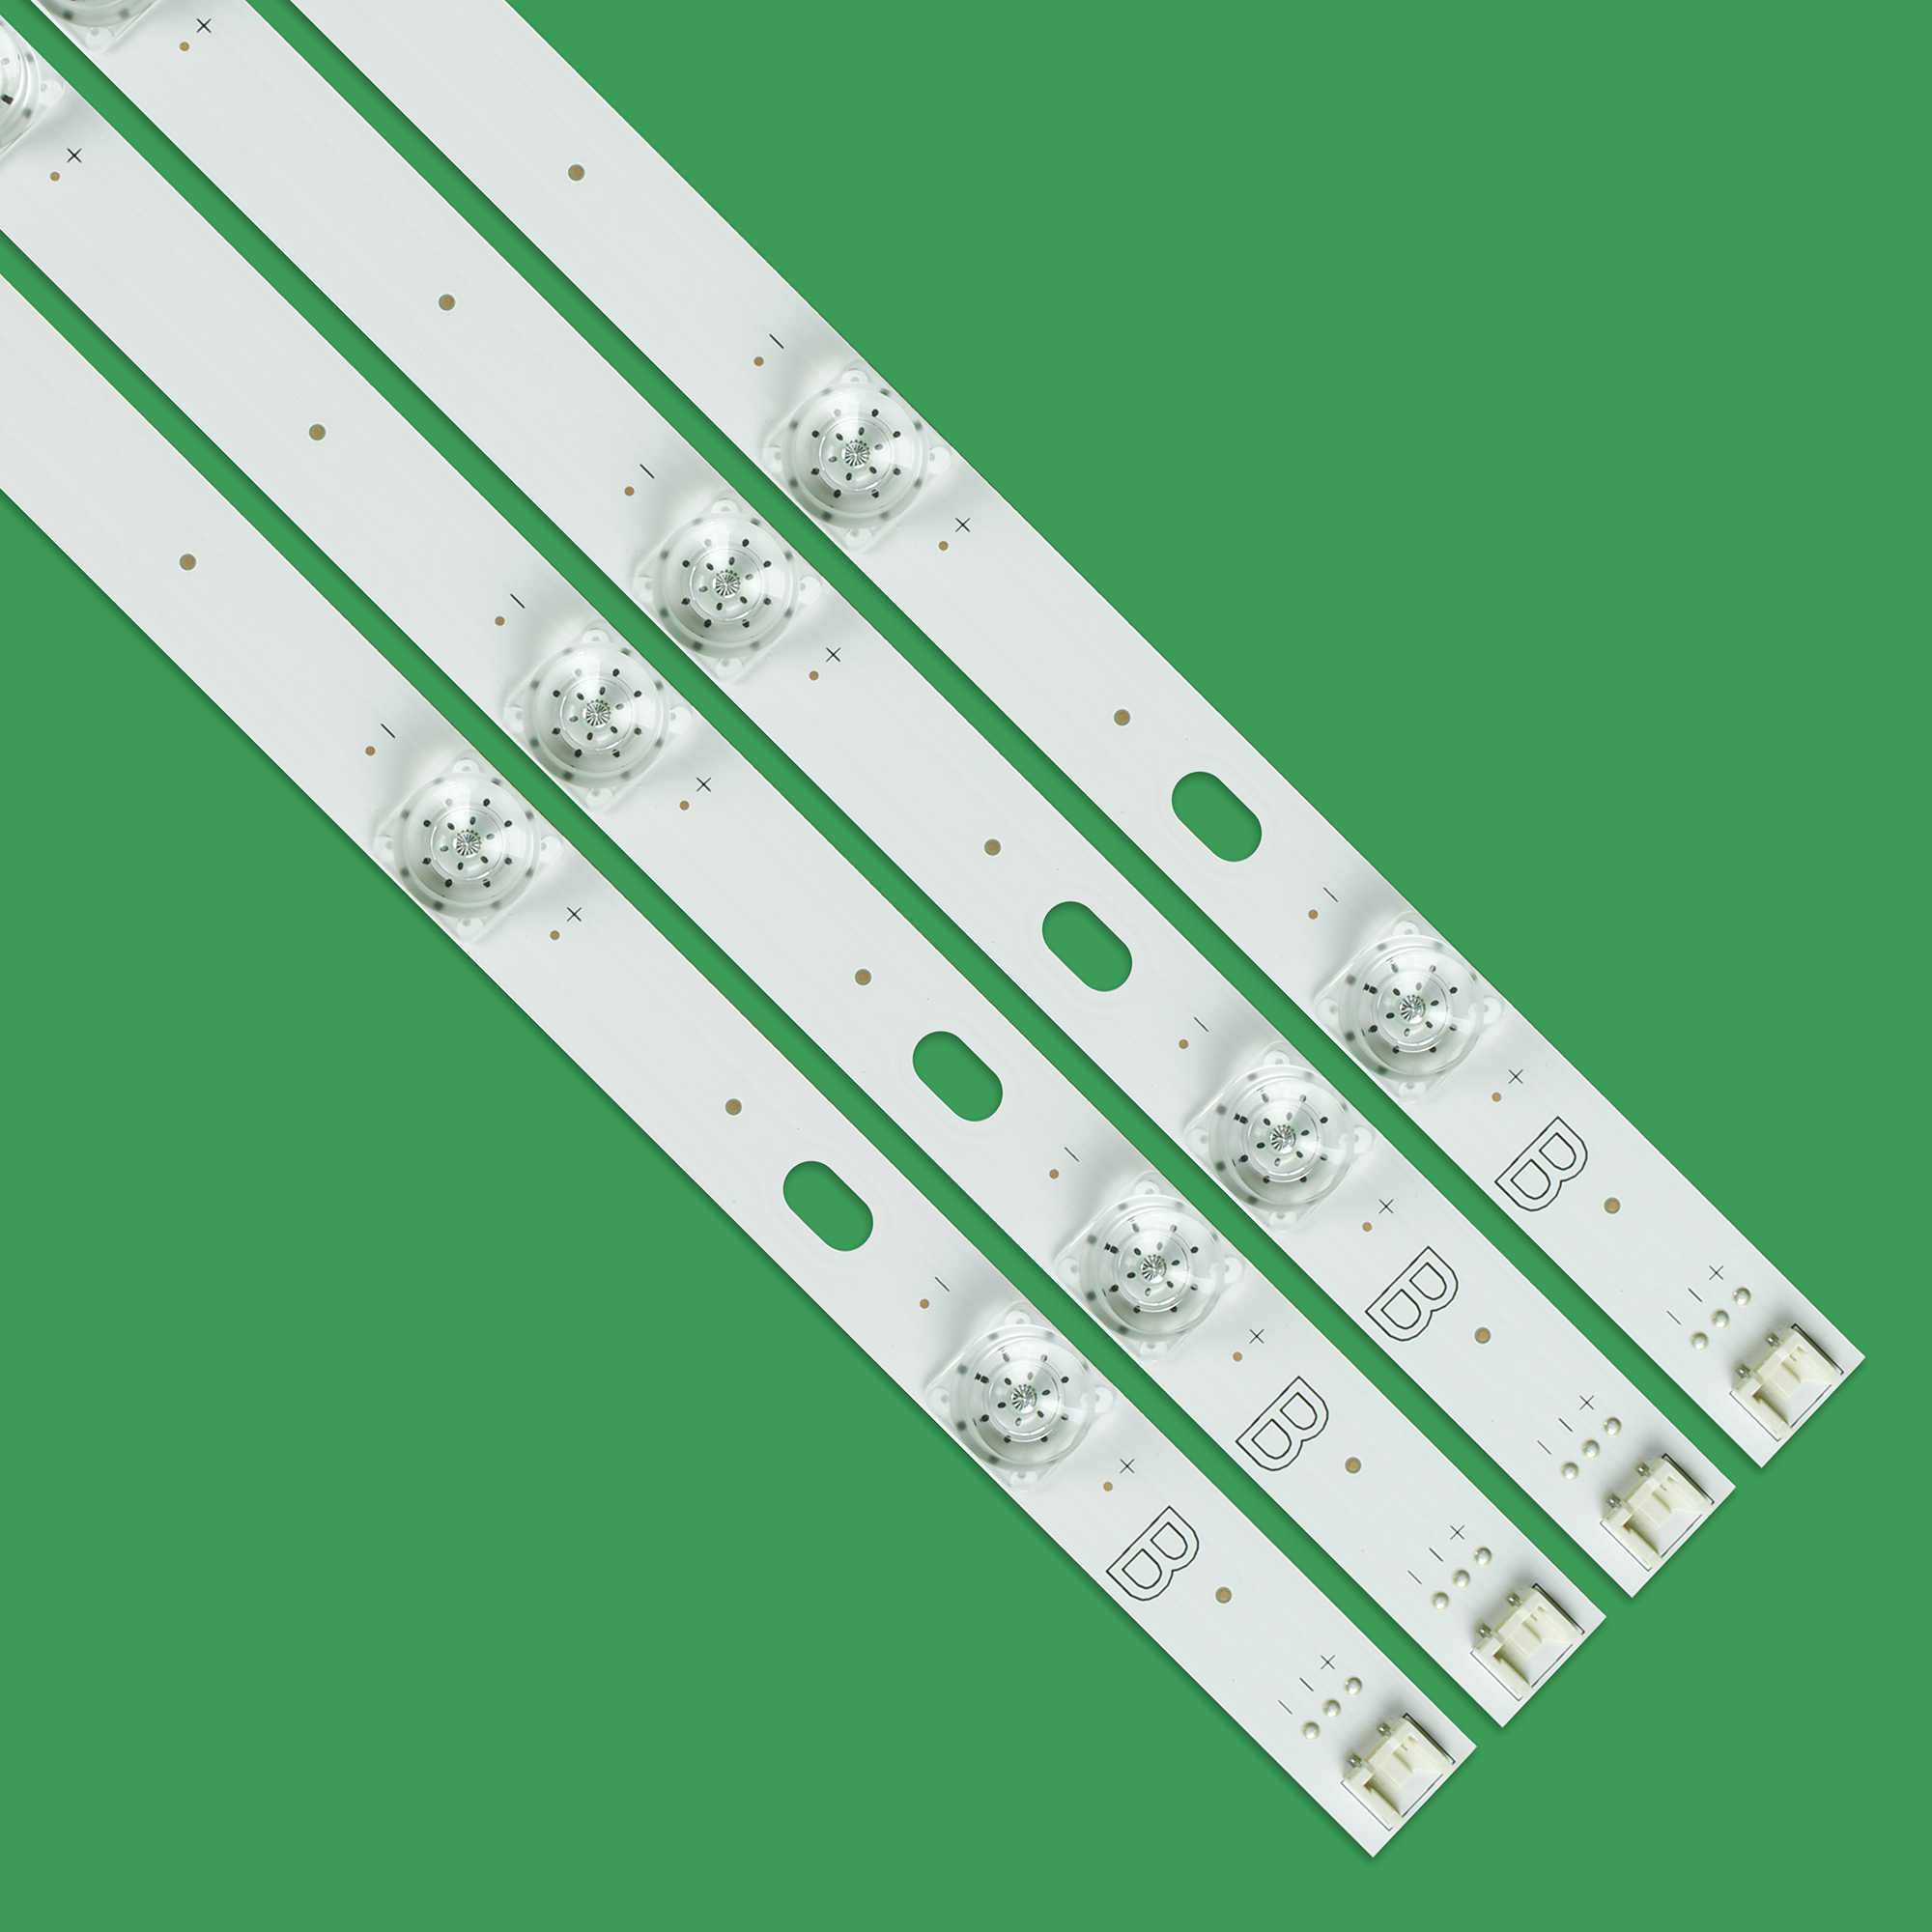 "8 stks/set Nieuwe LED Backlight Strip Voor LG 47LB650 47LB630 innotek DRT 3.0 47 ""EEN B-Type 6916L-1961A 6916L-1962A"